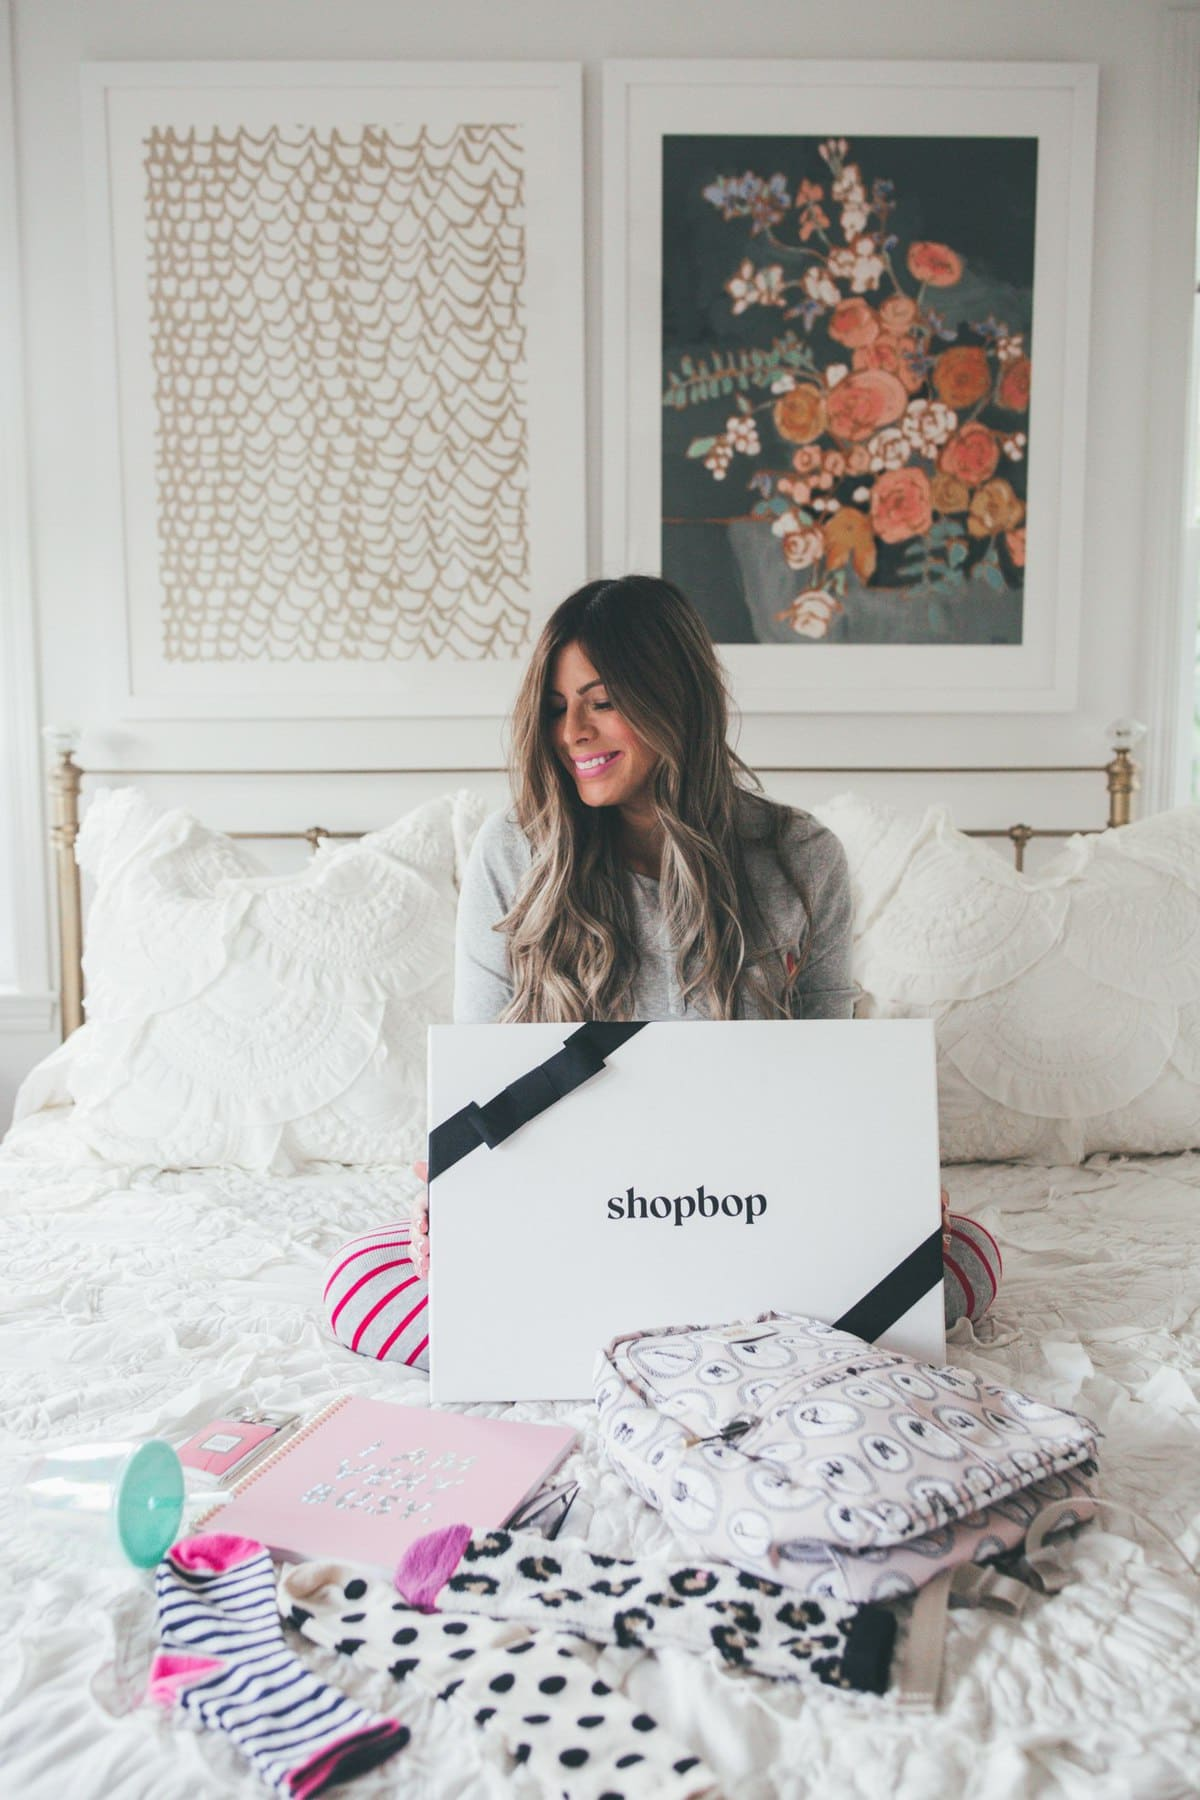 shopbop holiday gifting guide